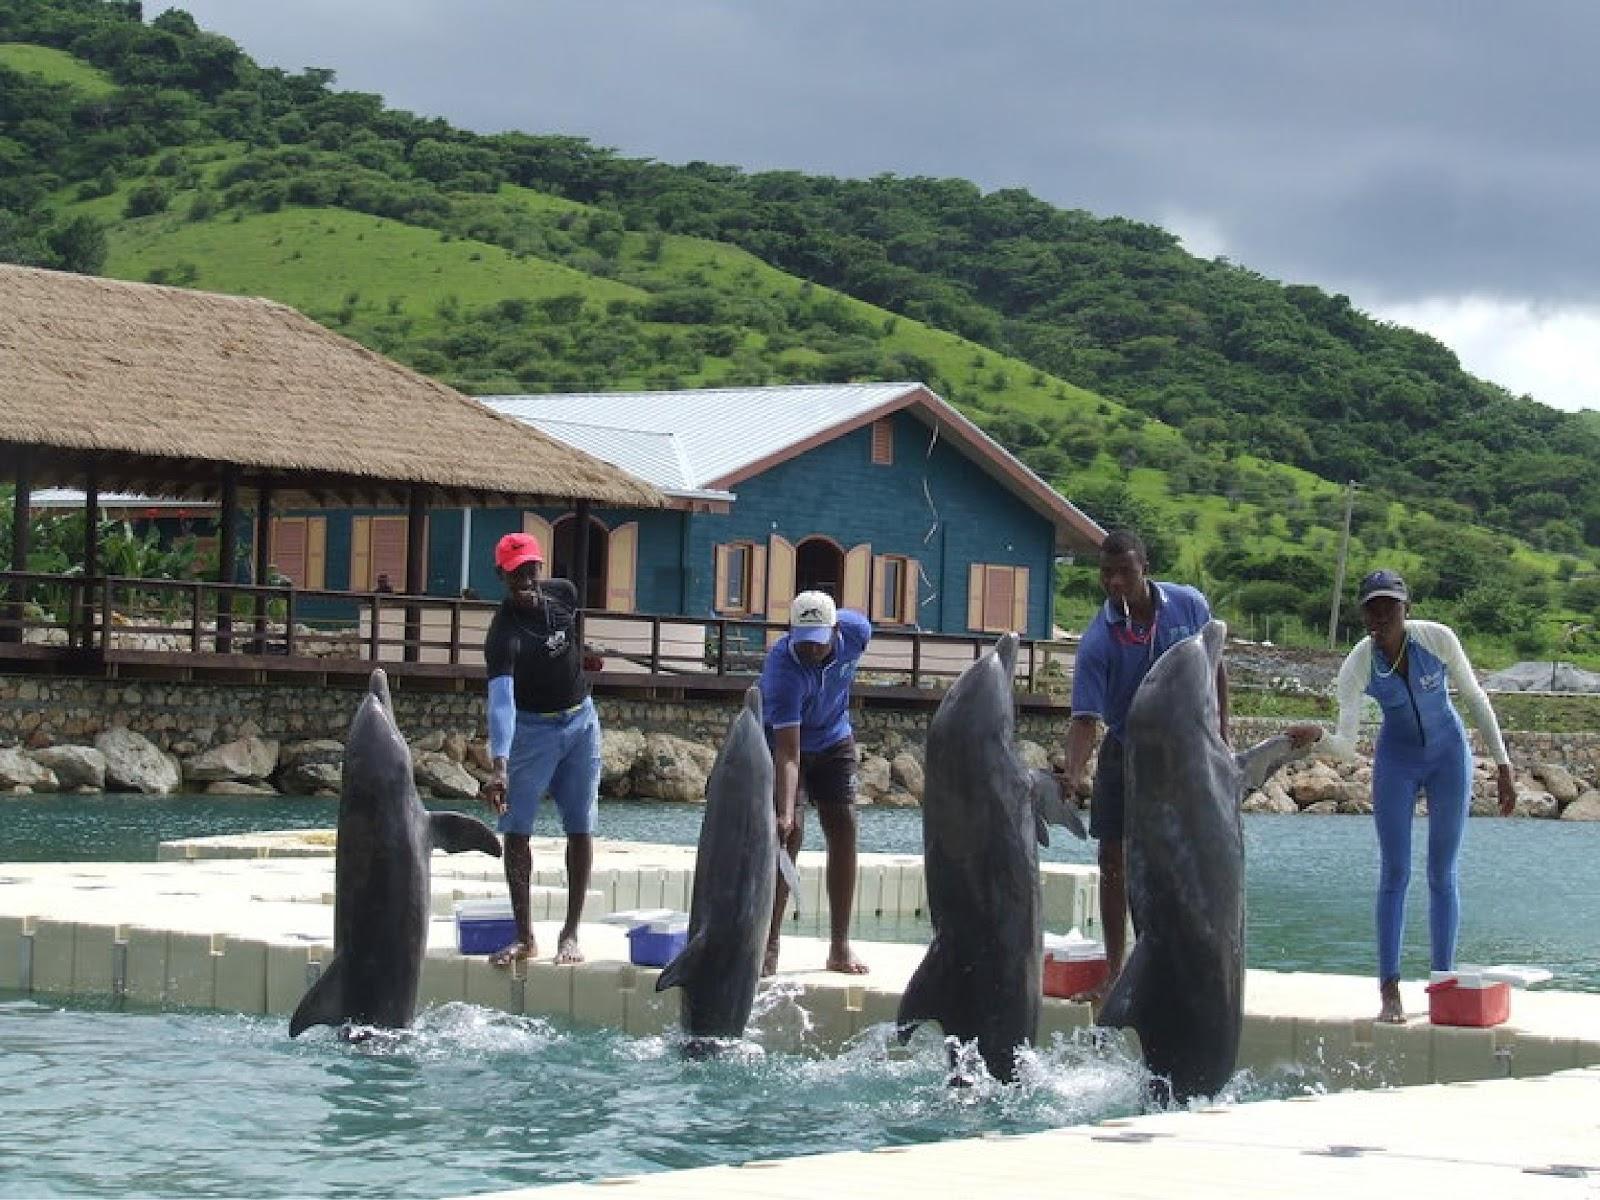 dolphin cove jamaica. Black Bedroom Furniture Sets. Home Design Ideas